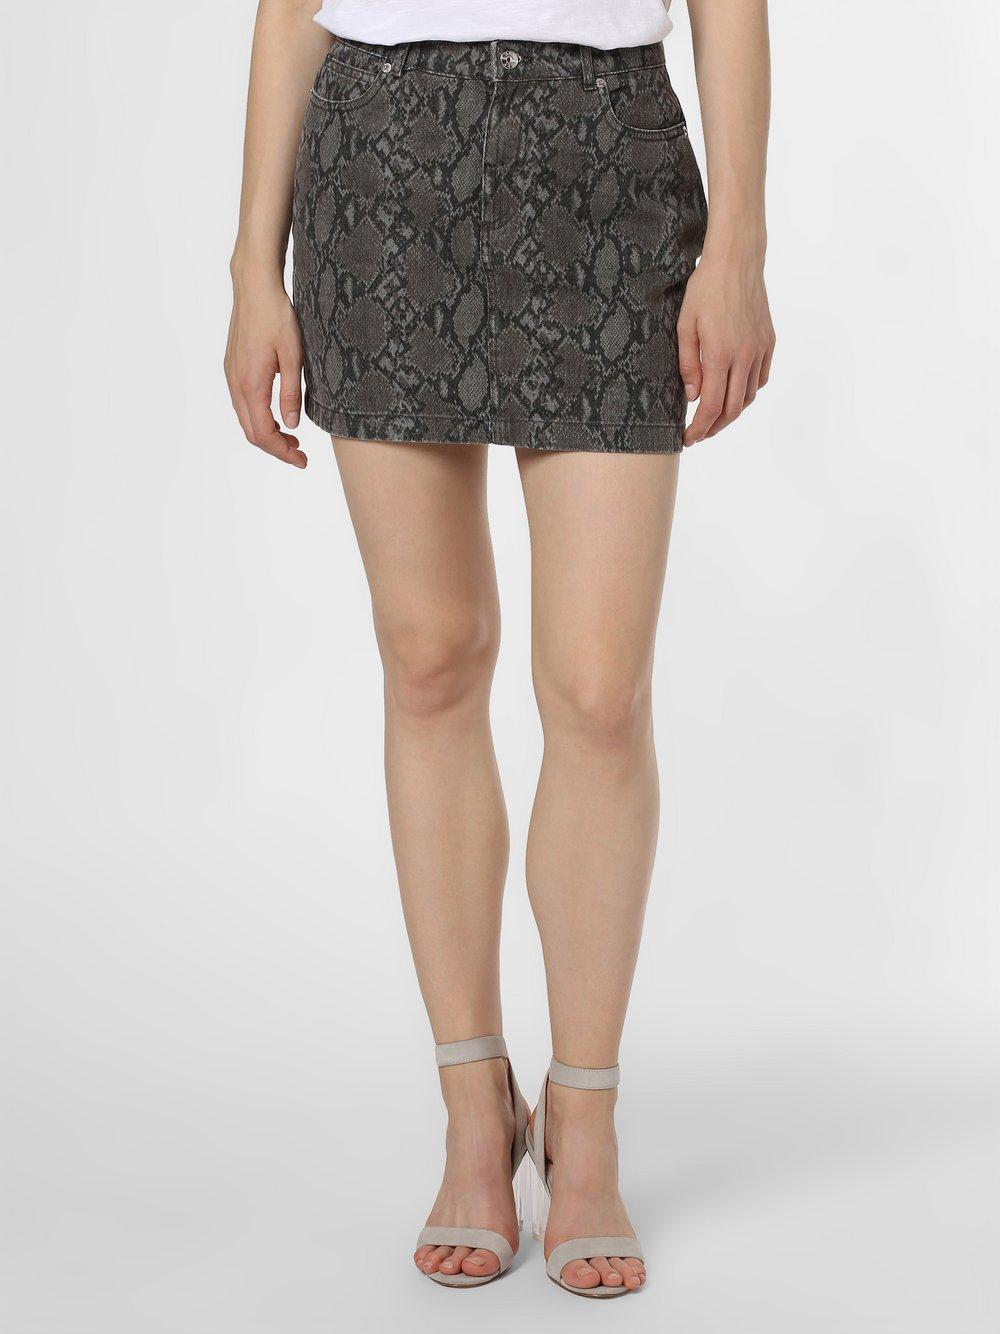 ONLY - Jeansowa spódnica damska – Onlvicky, szary